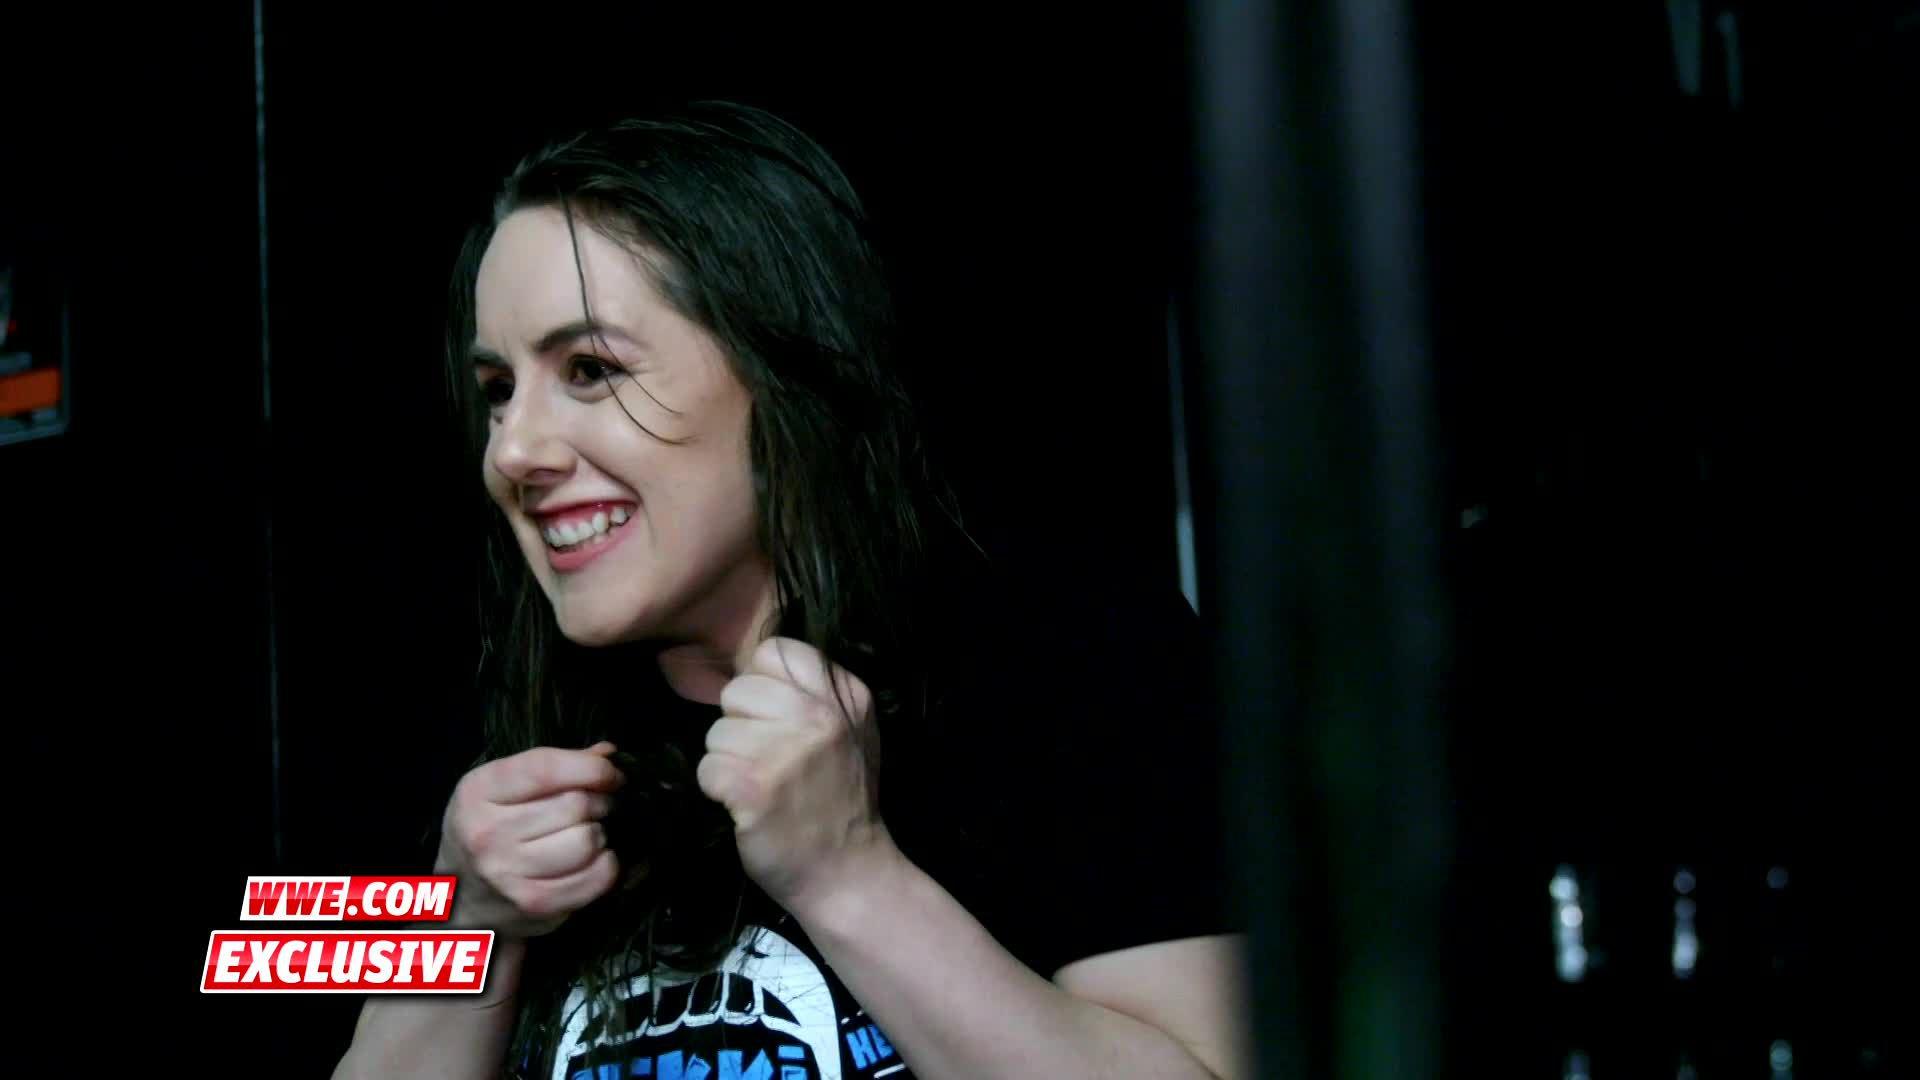 Nikki Cross réagit à l'annonce d'Alexa Bliss concernant WrestleMania: Exclusivité WWE.fr, 12 Mars 2019